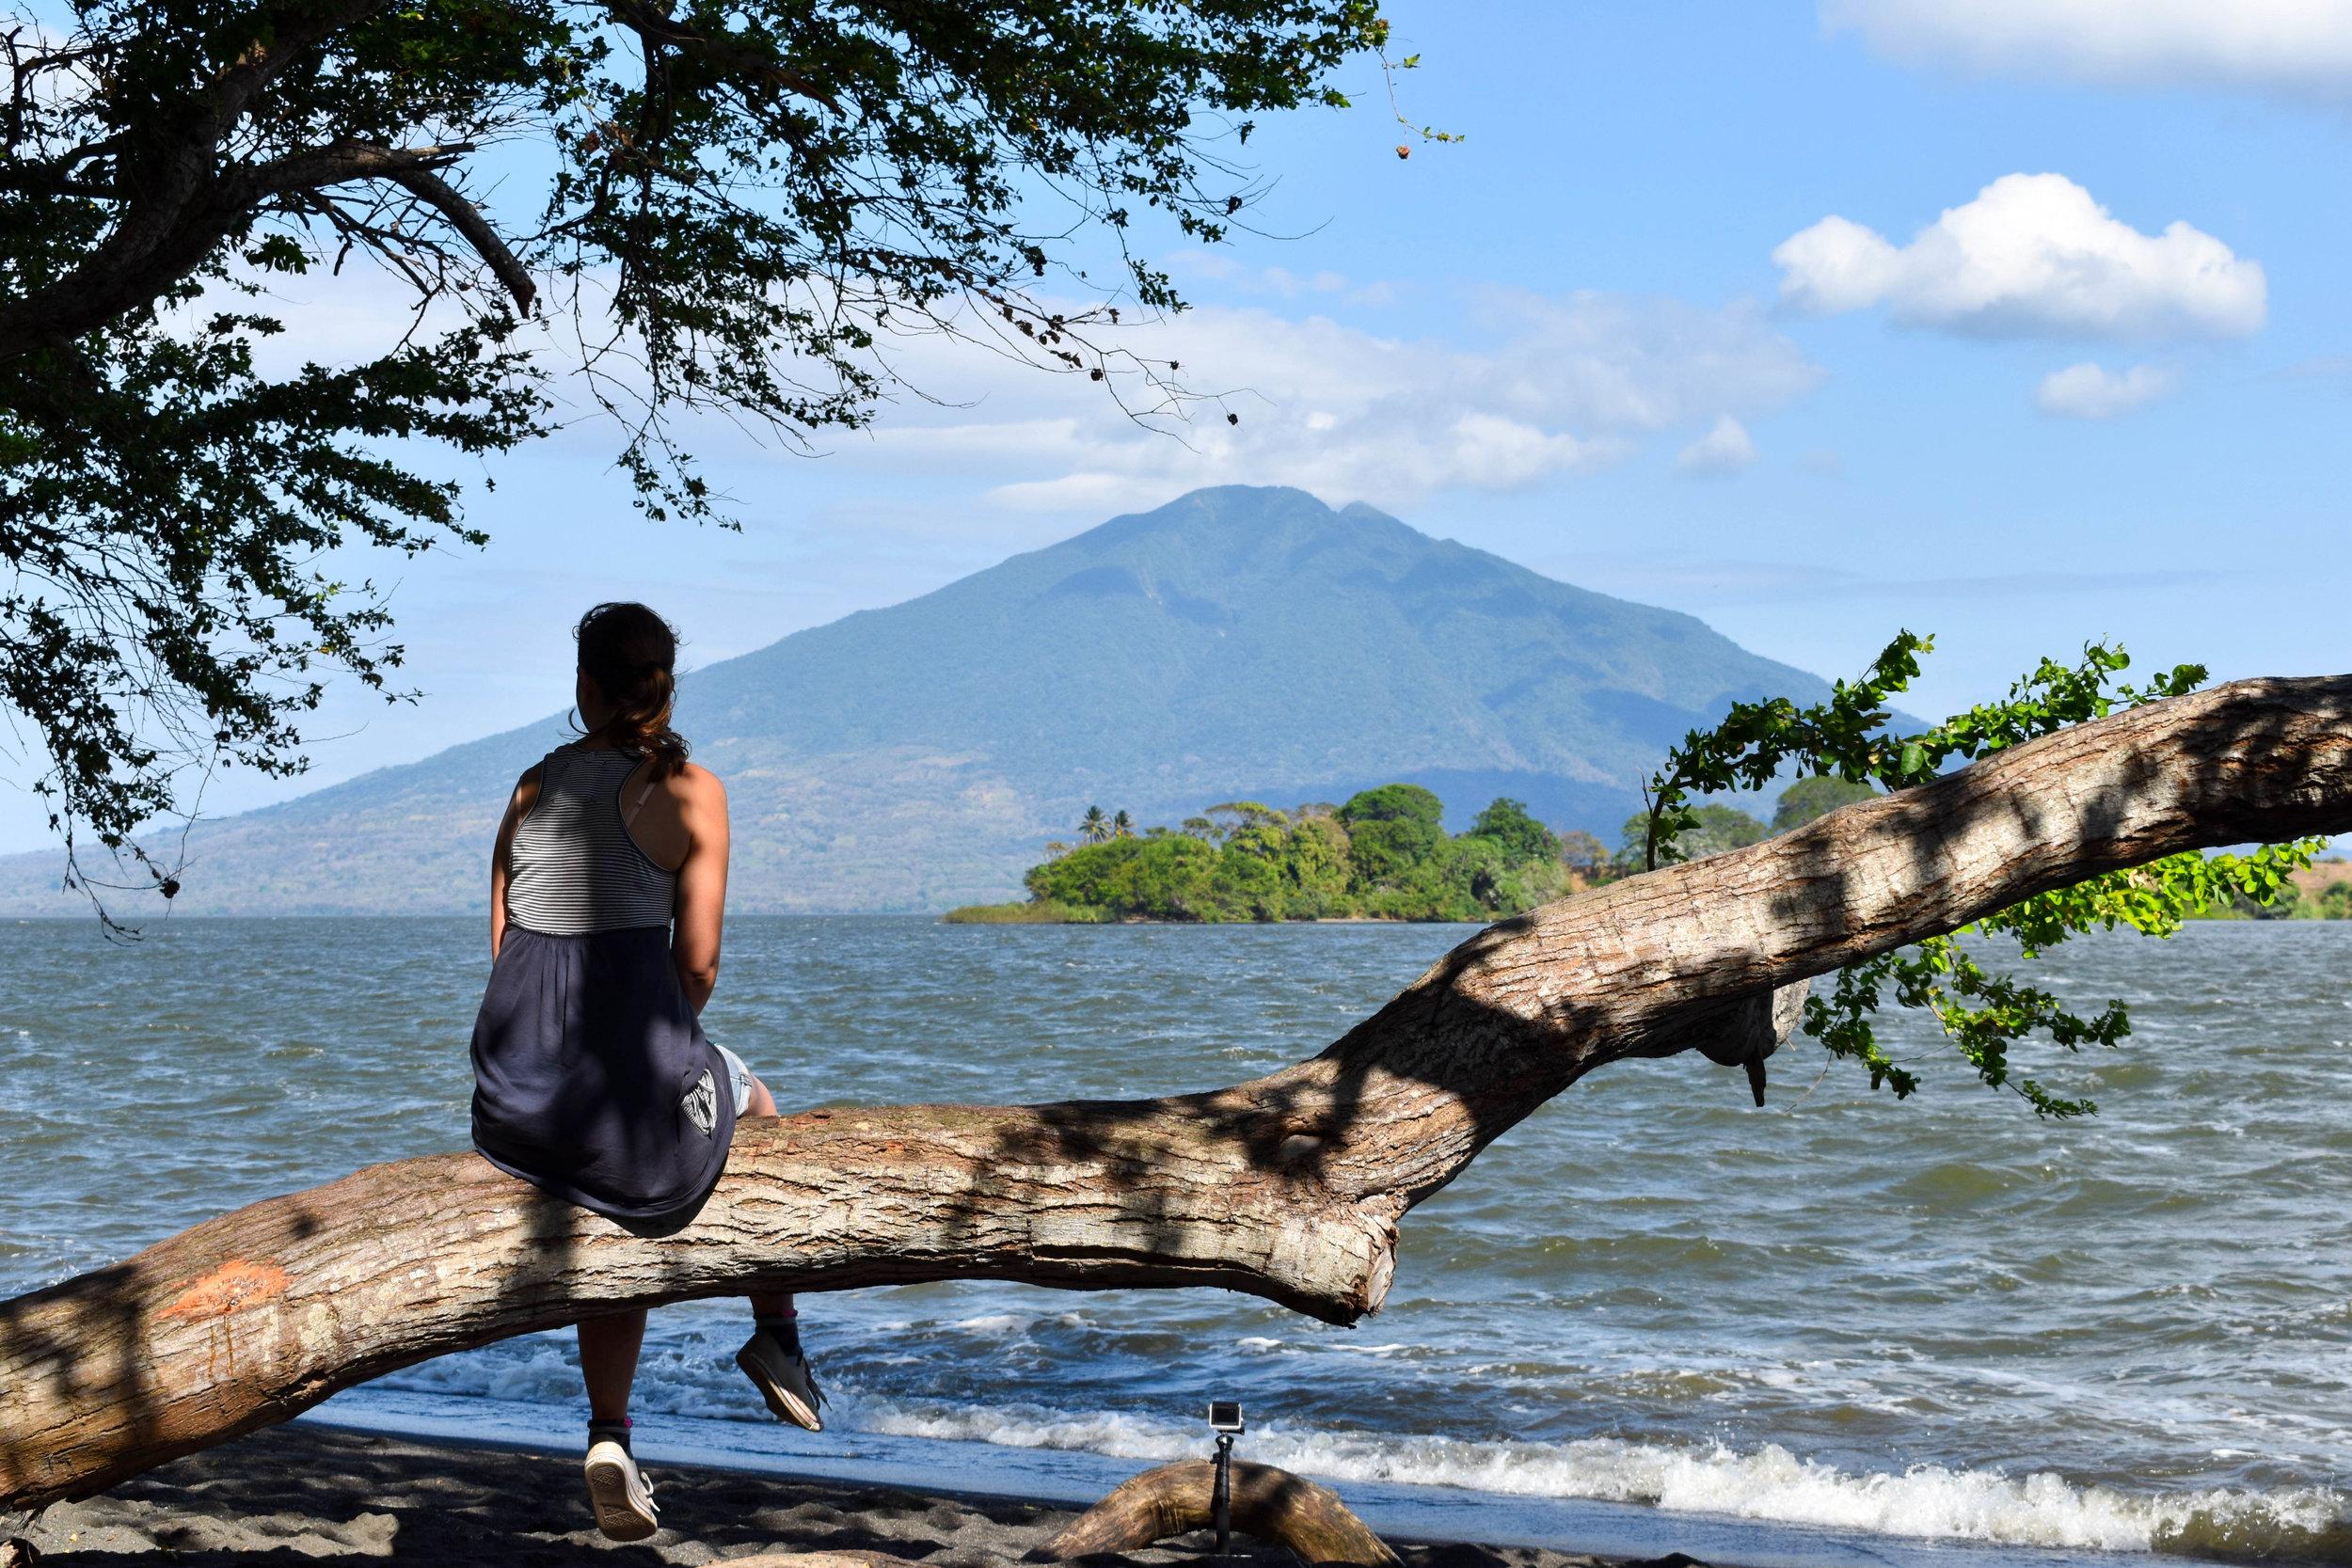 Nature's Bench Overlooking a Volcano in Nicaragua